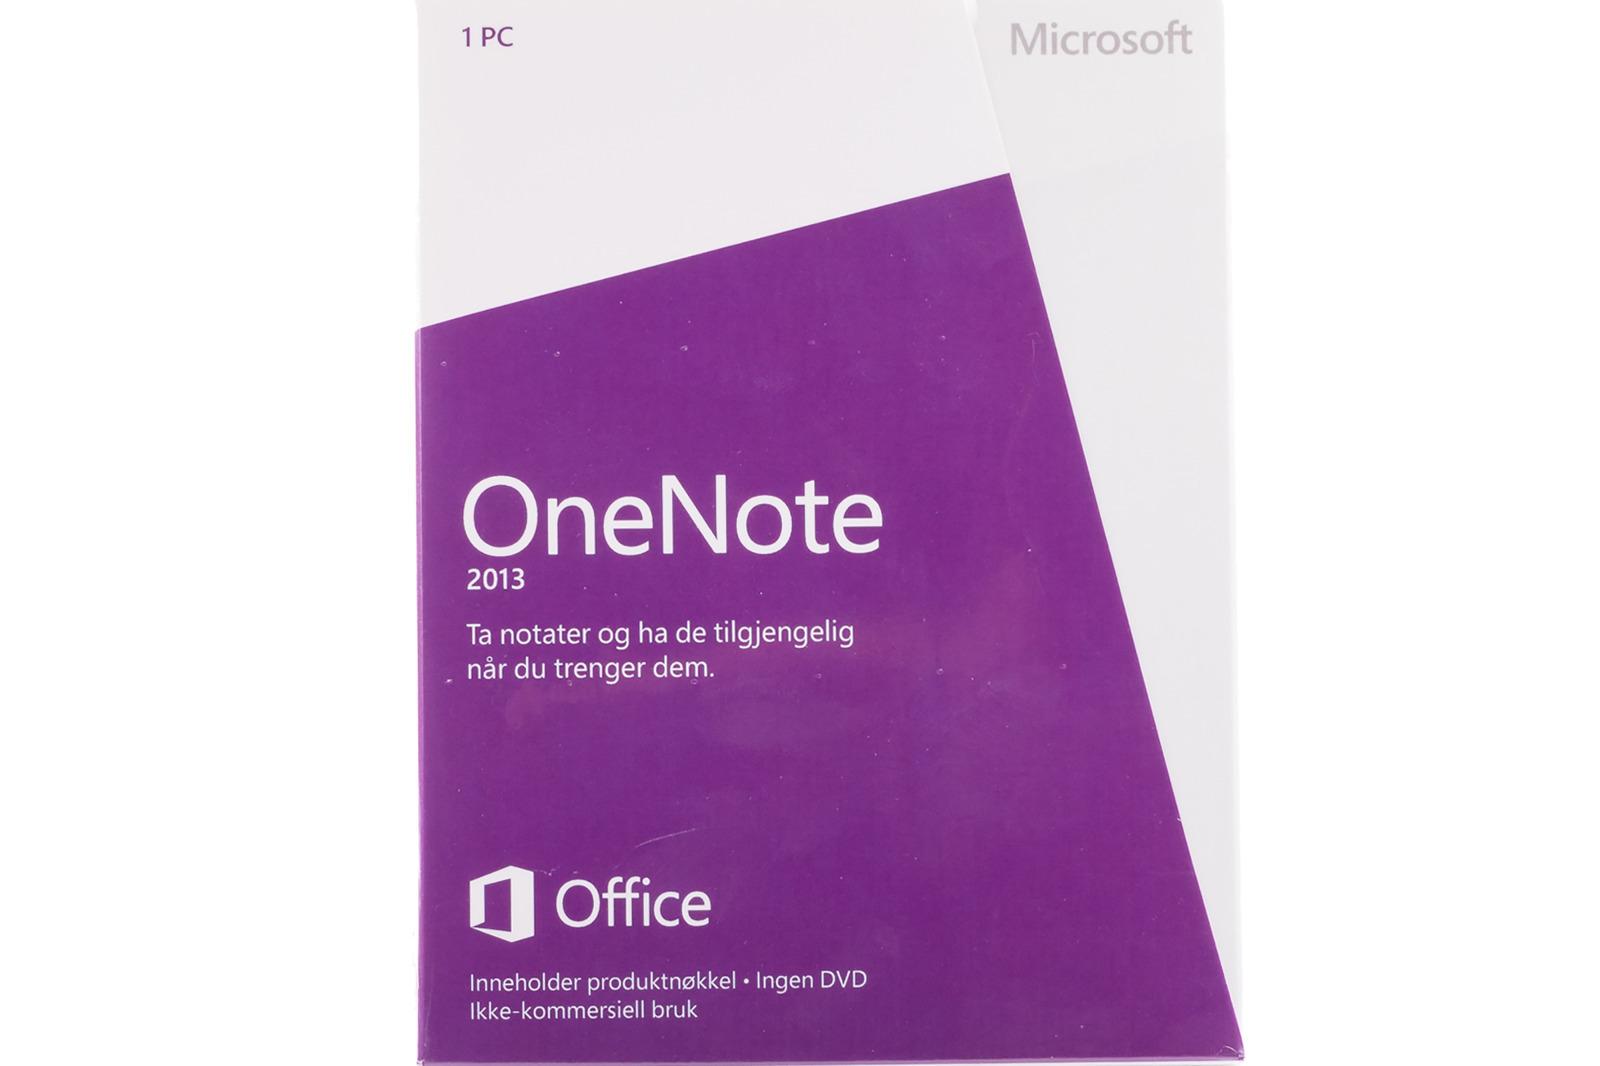 New Sealed Original Microsoft OneNote 2013 S26-05113 Swedish Medialess Eurozone